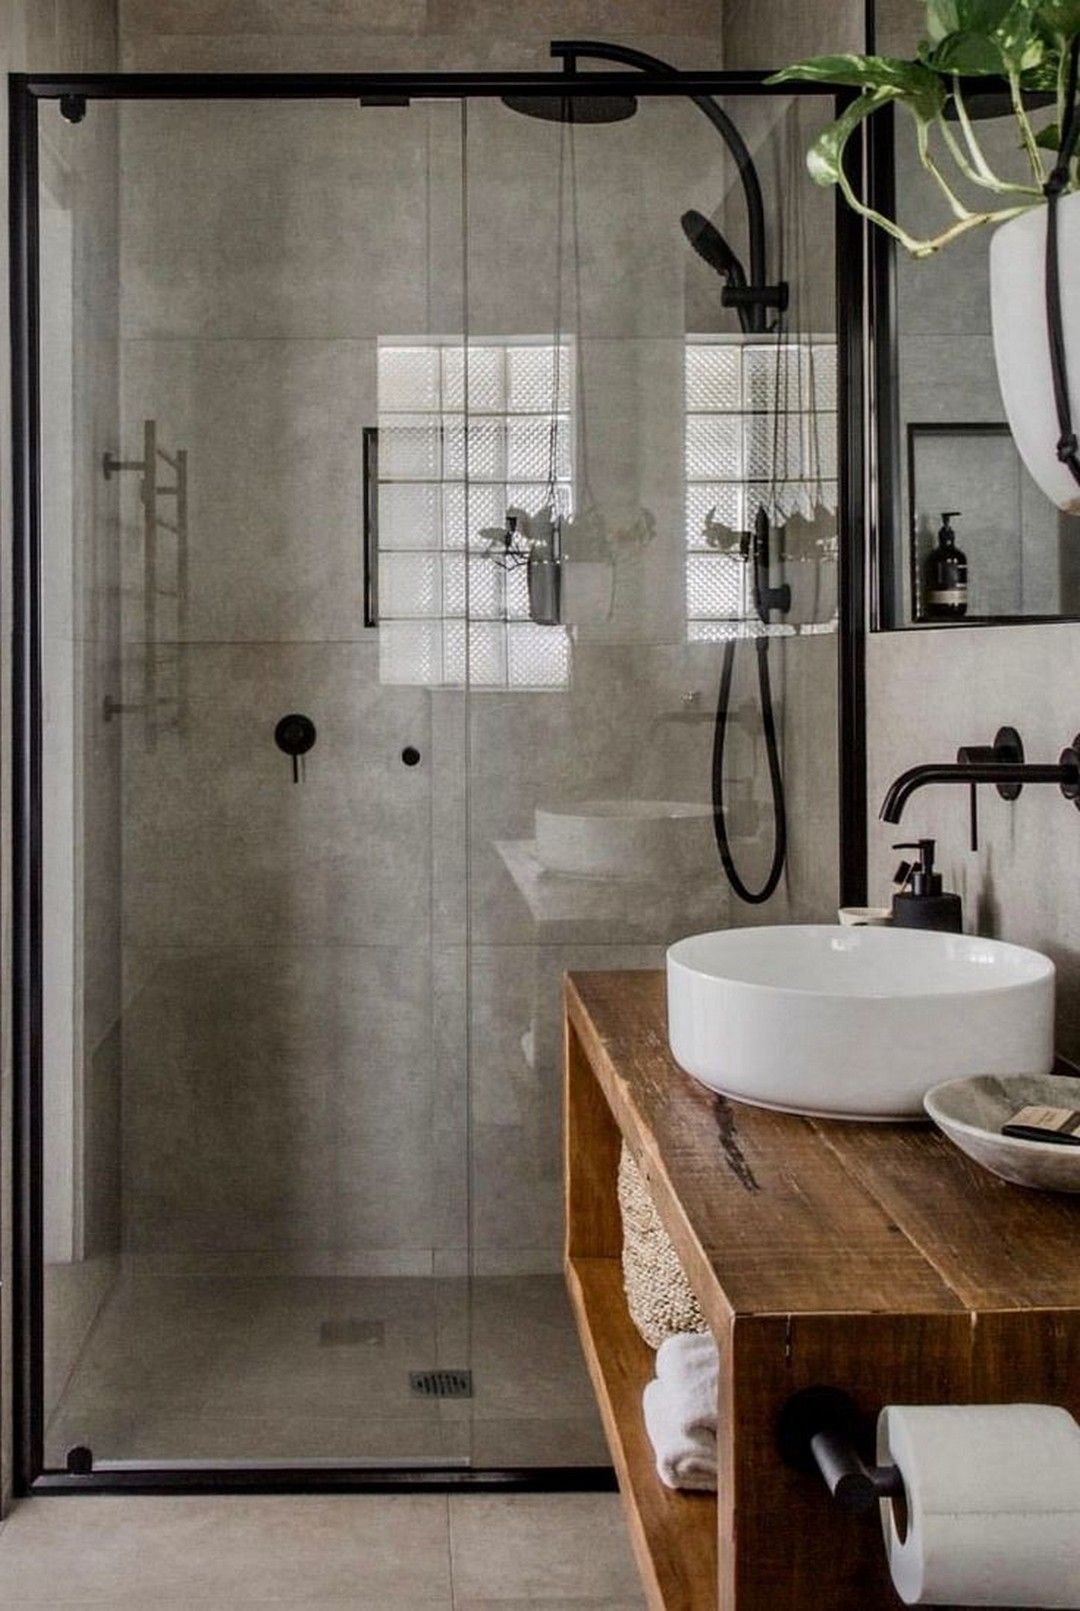 28 Beautiful Farmhouse Bathroom Design And Decor Ideas You Will Go Crazy For House Living Small Bathroom Remodel Rustic Bathroom Designs Bathroom Design